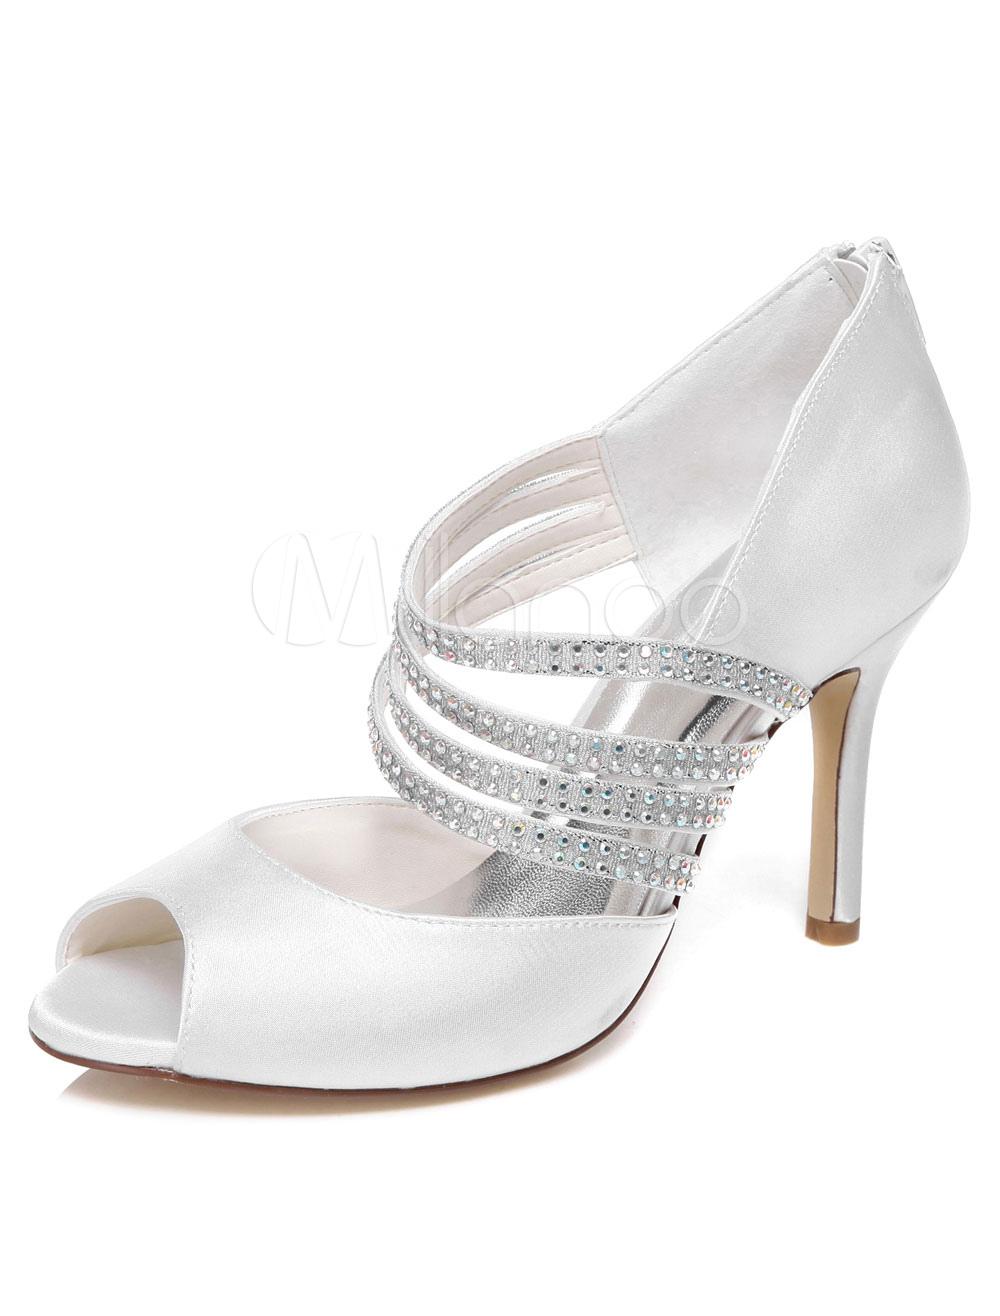 Ivory Rhinestones Satin Peep Toe Evening&Bridal Sandals for Women